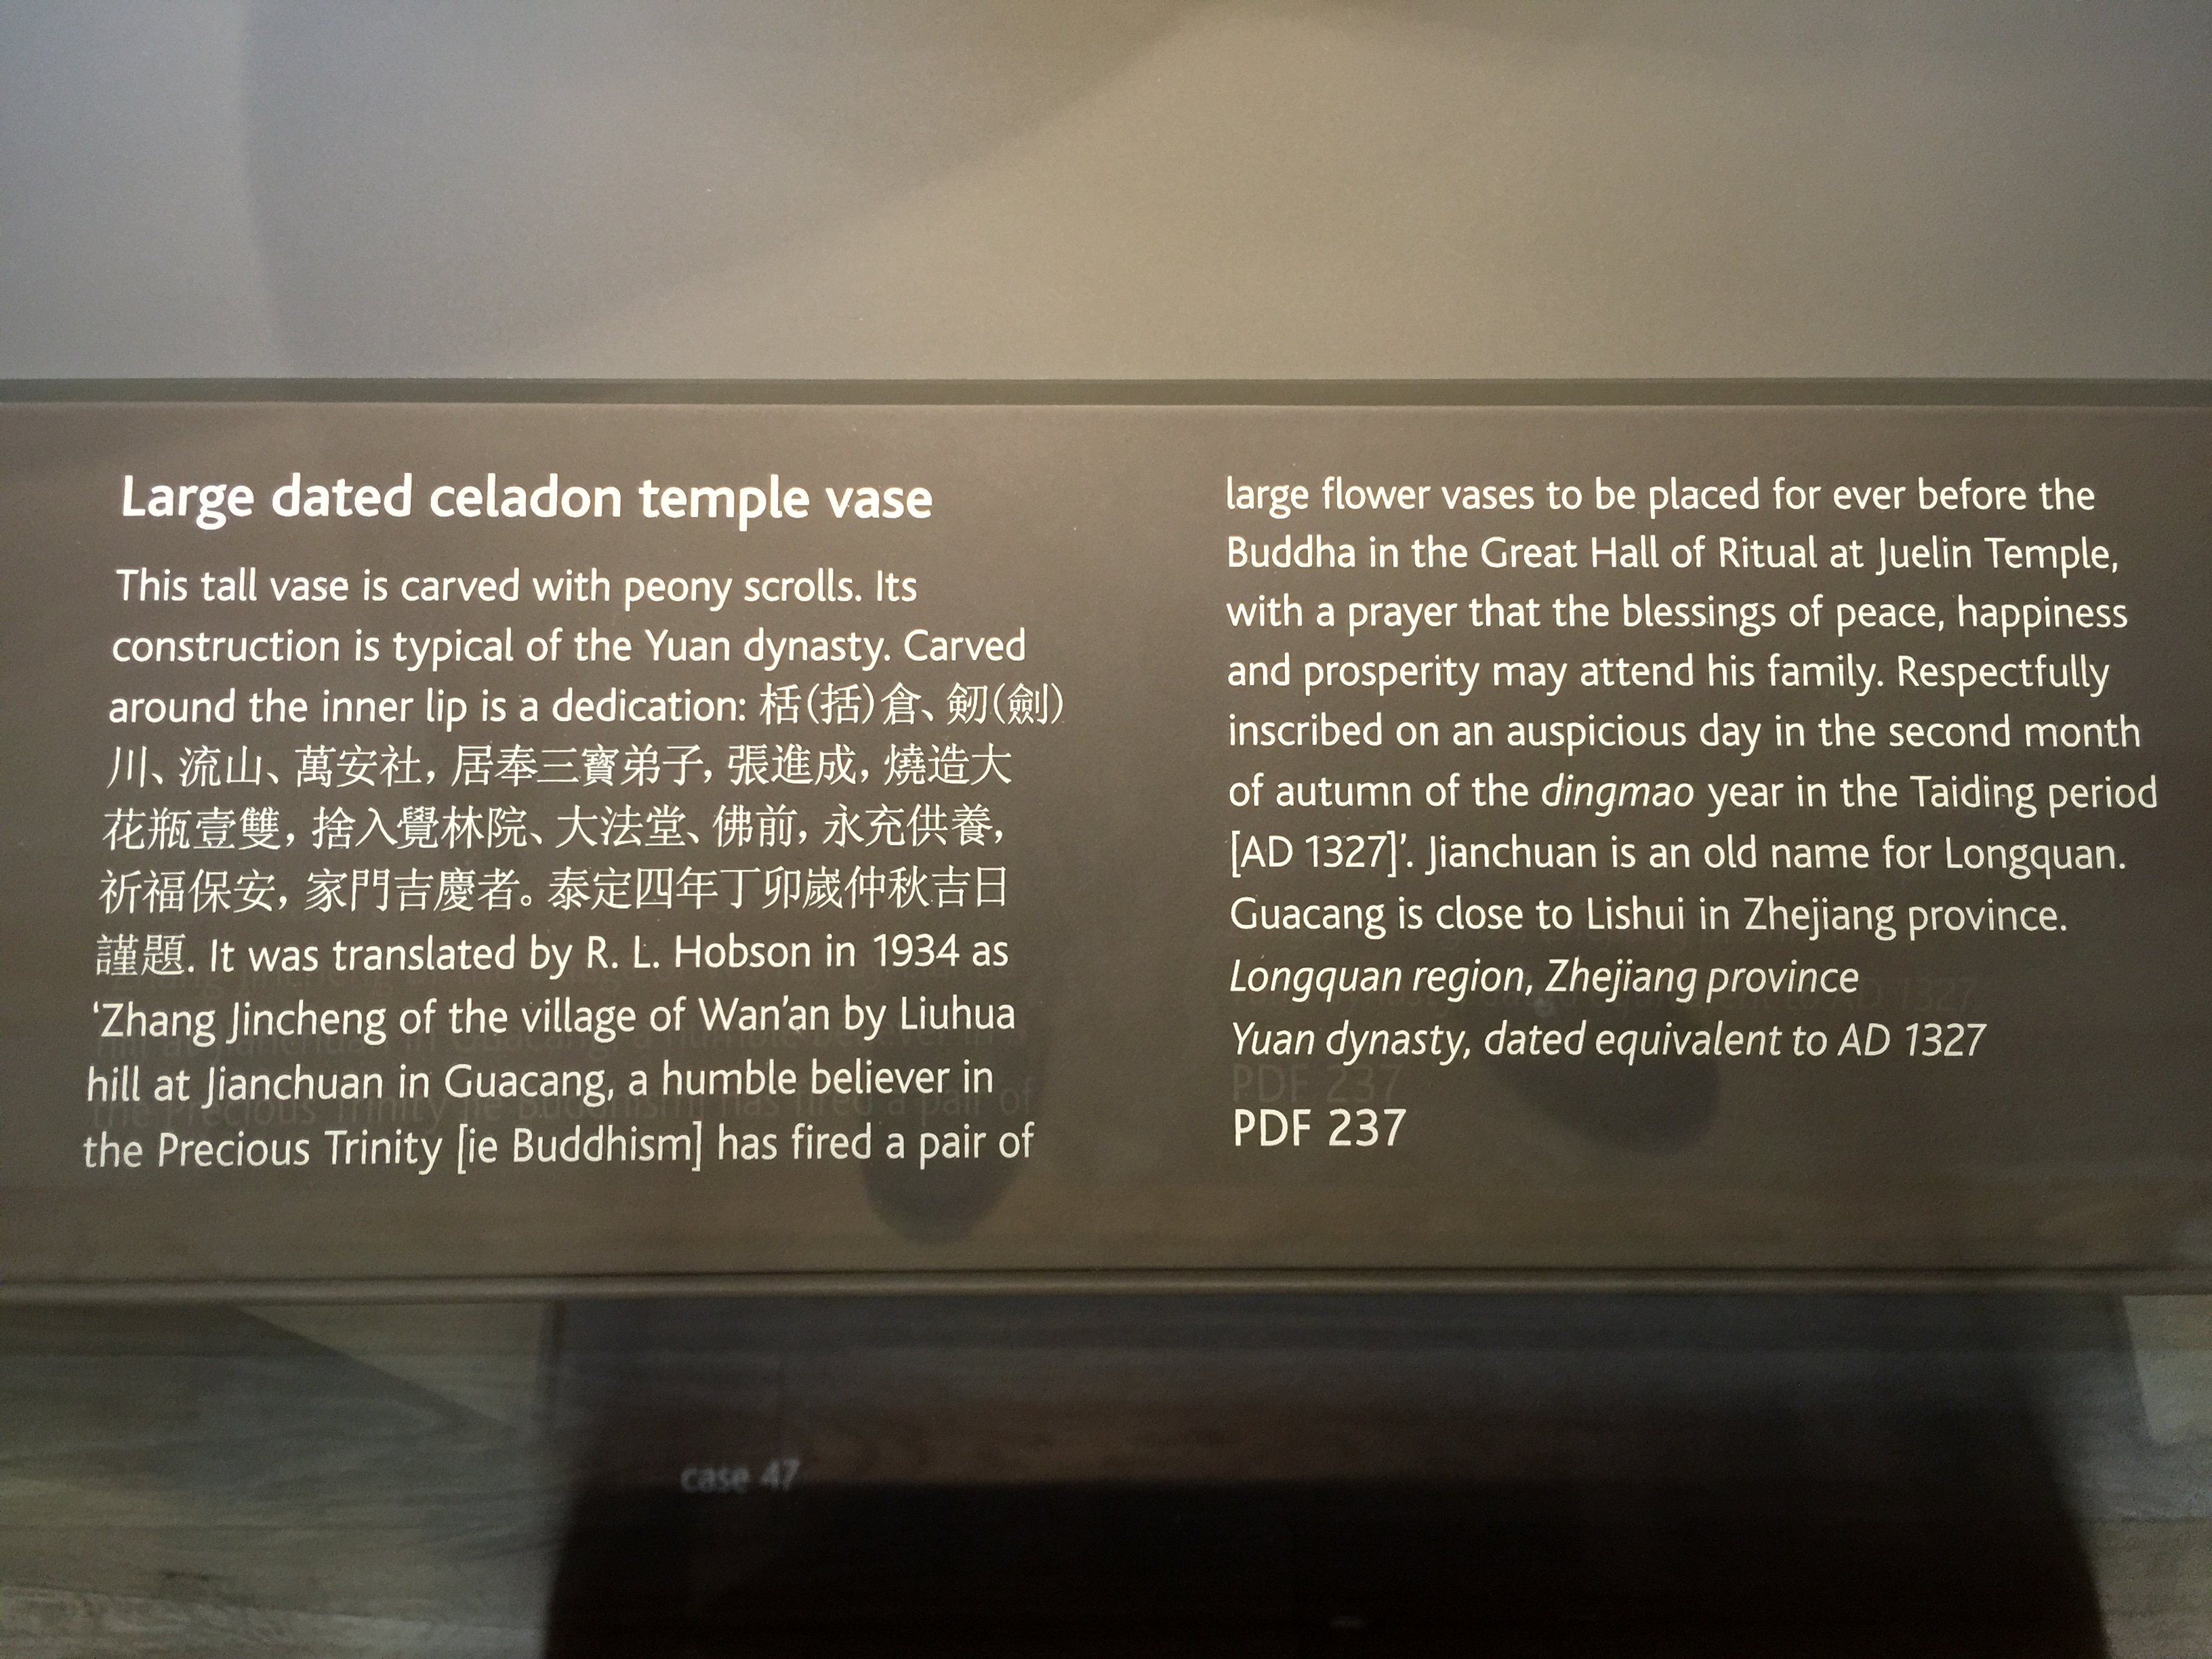 Chinese-Porcelain-British-Museum-Percival-David-jessewaugh.com-13.jpg